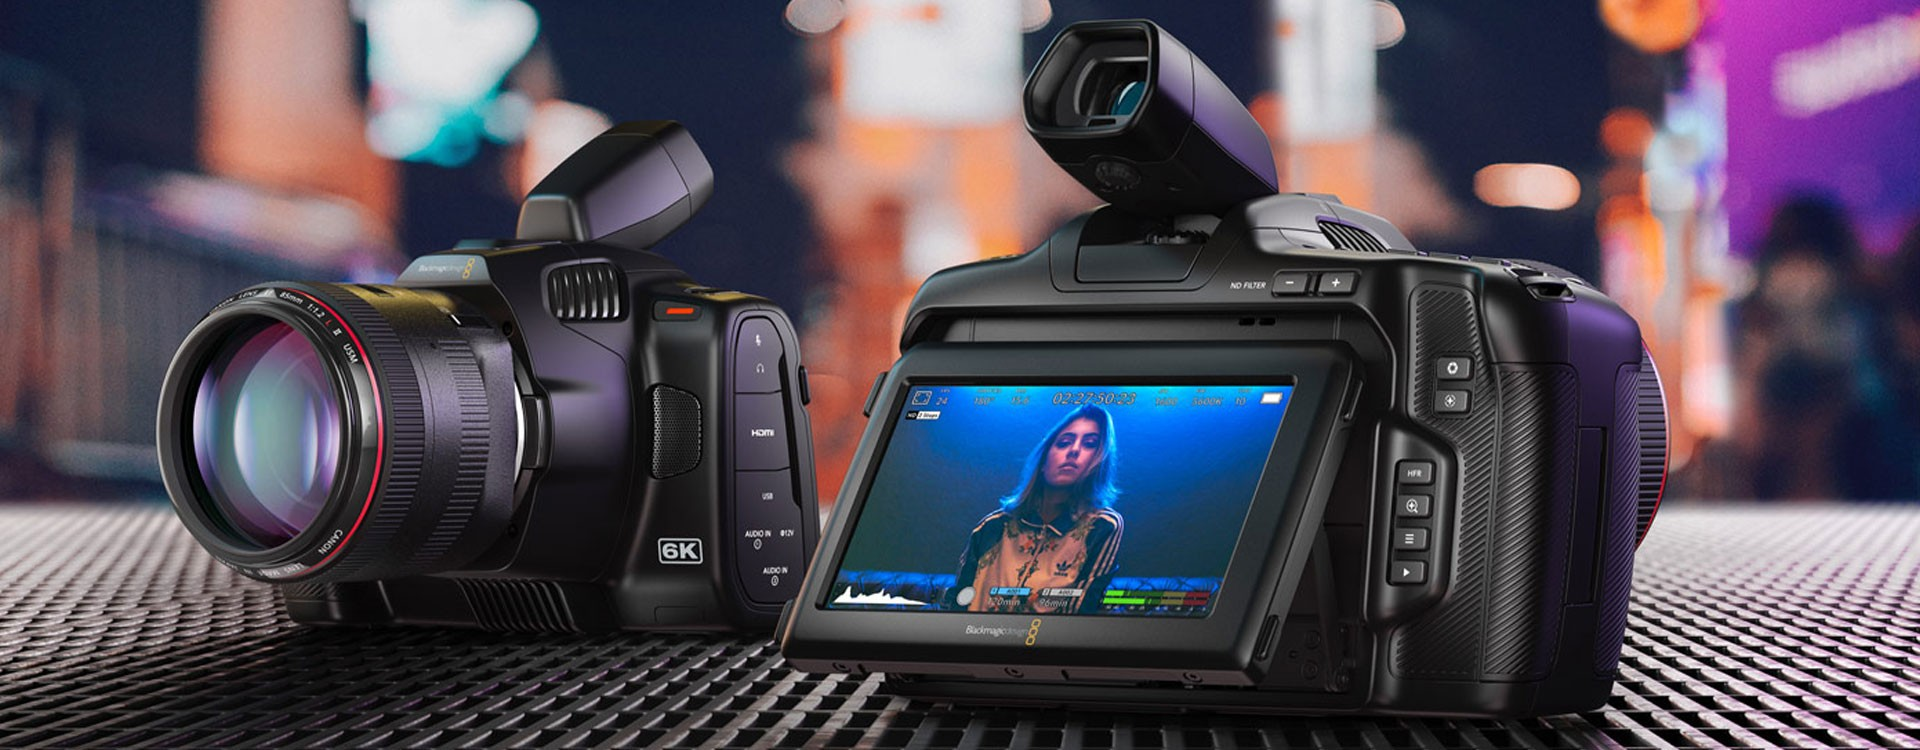 Blackmagic Design annonce la nouvelle Pocket Cinema Camera 6K Pro